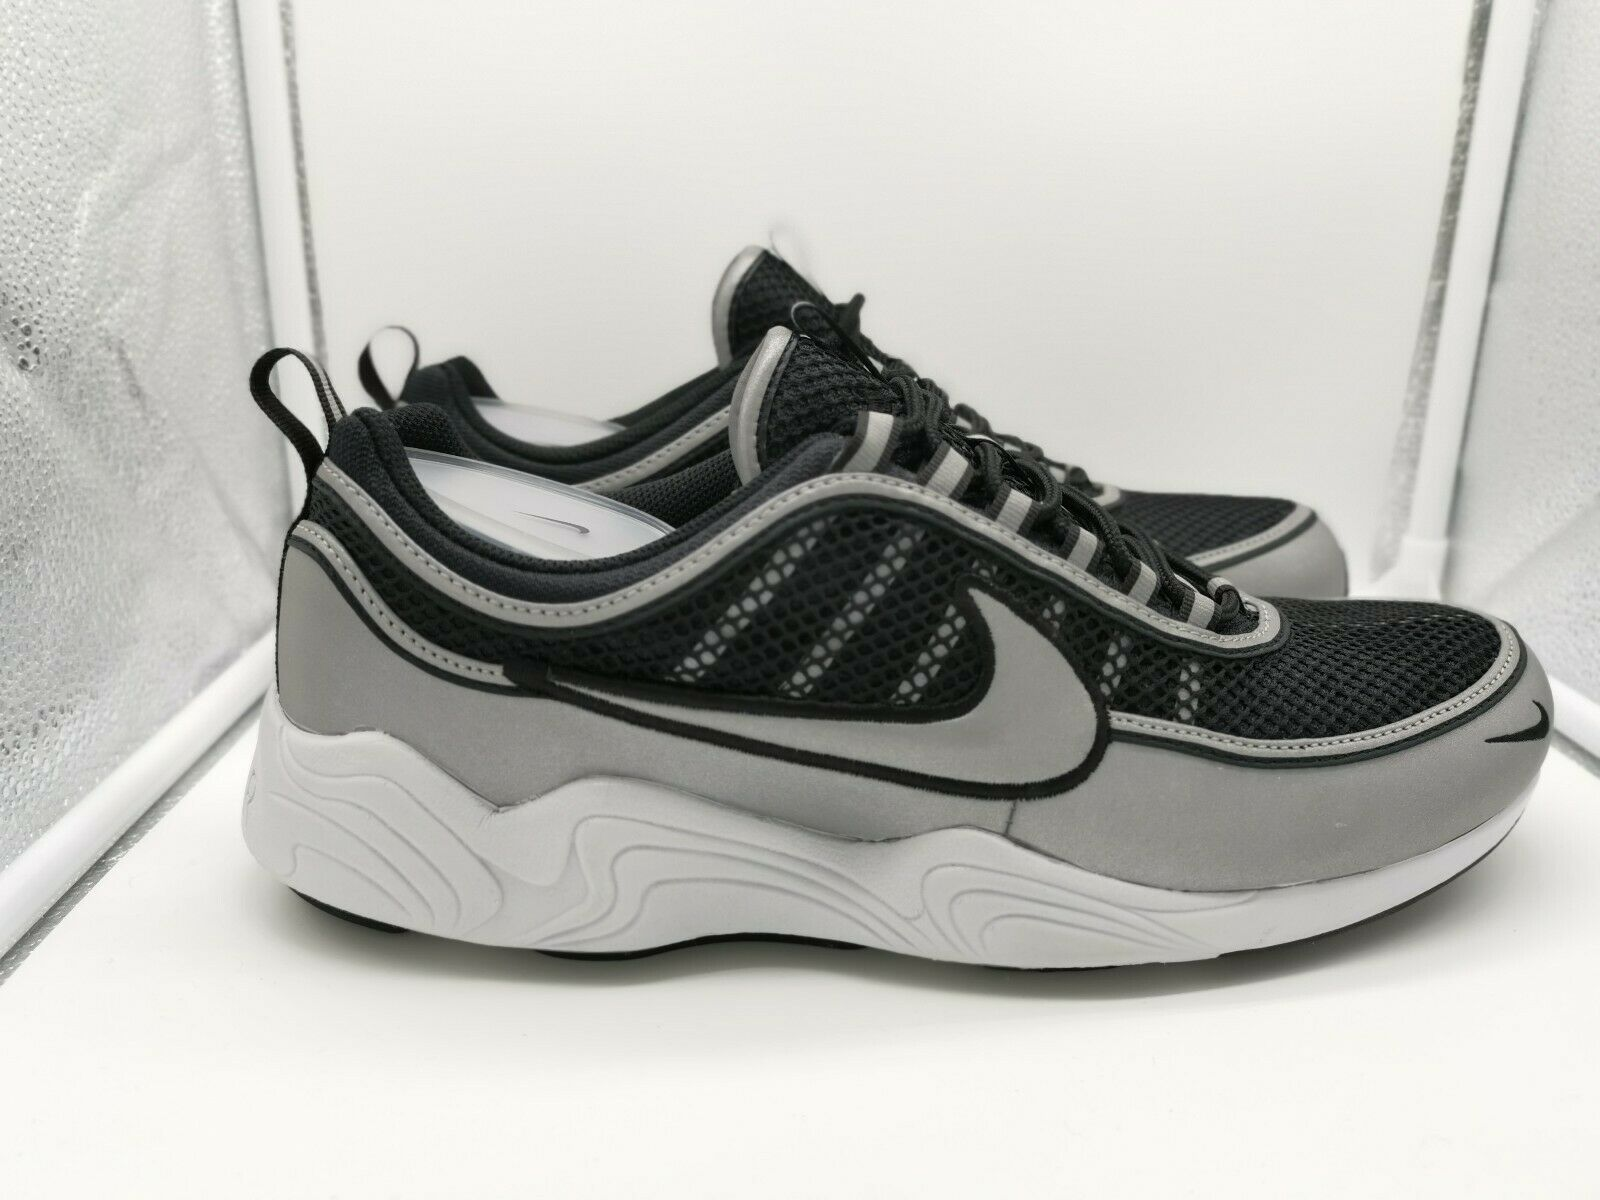 Nike Air Zoom Spiridon '16 Black Metallic Silver 926955-003 926955-003 926955-003 8d1eb8